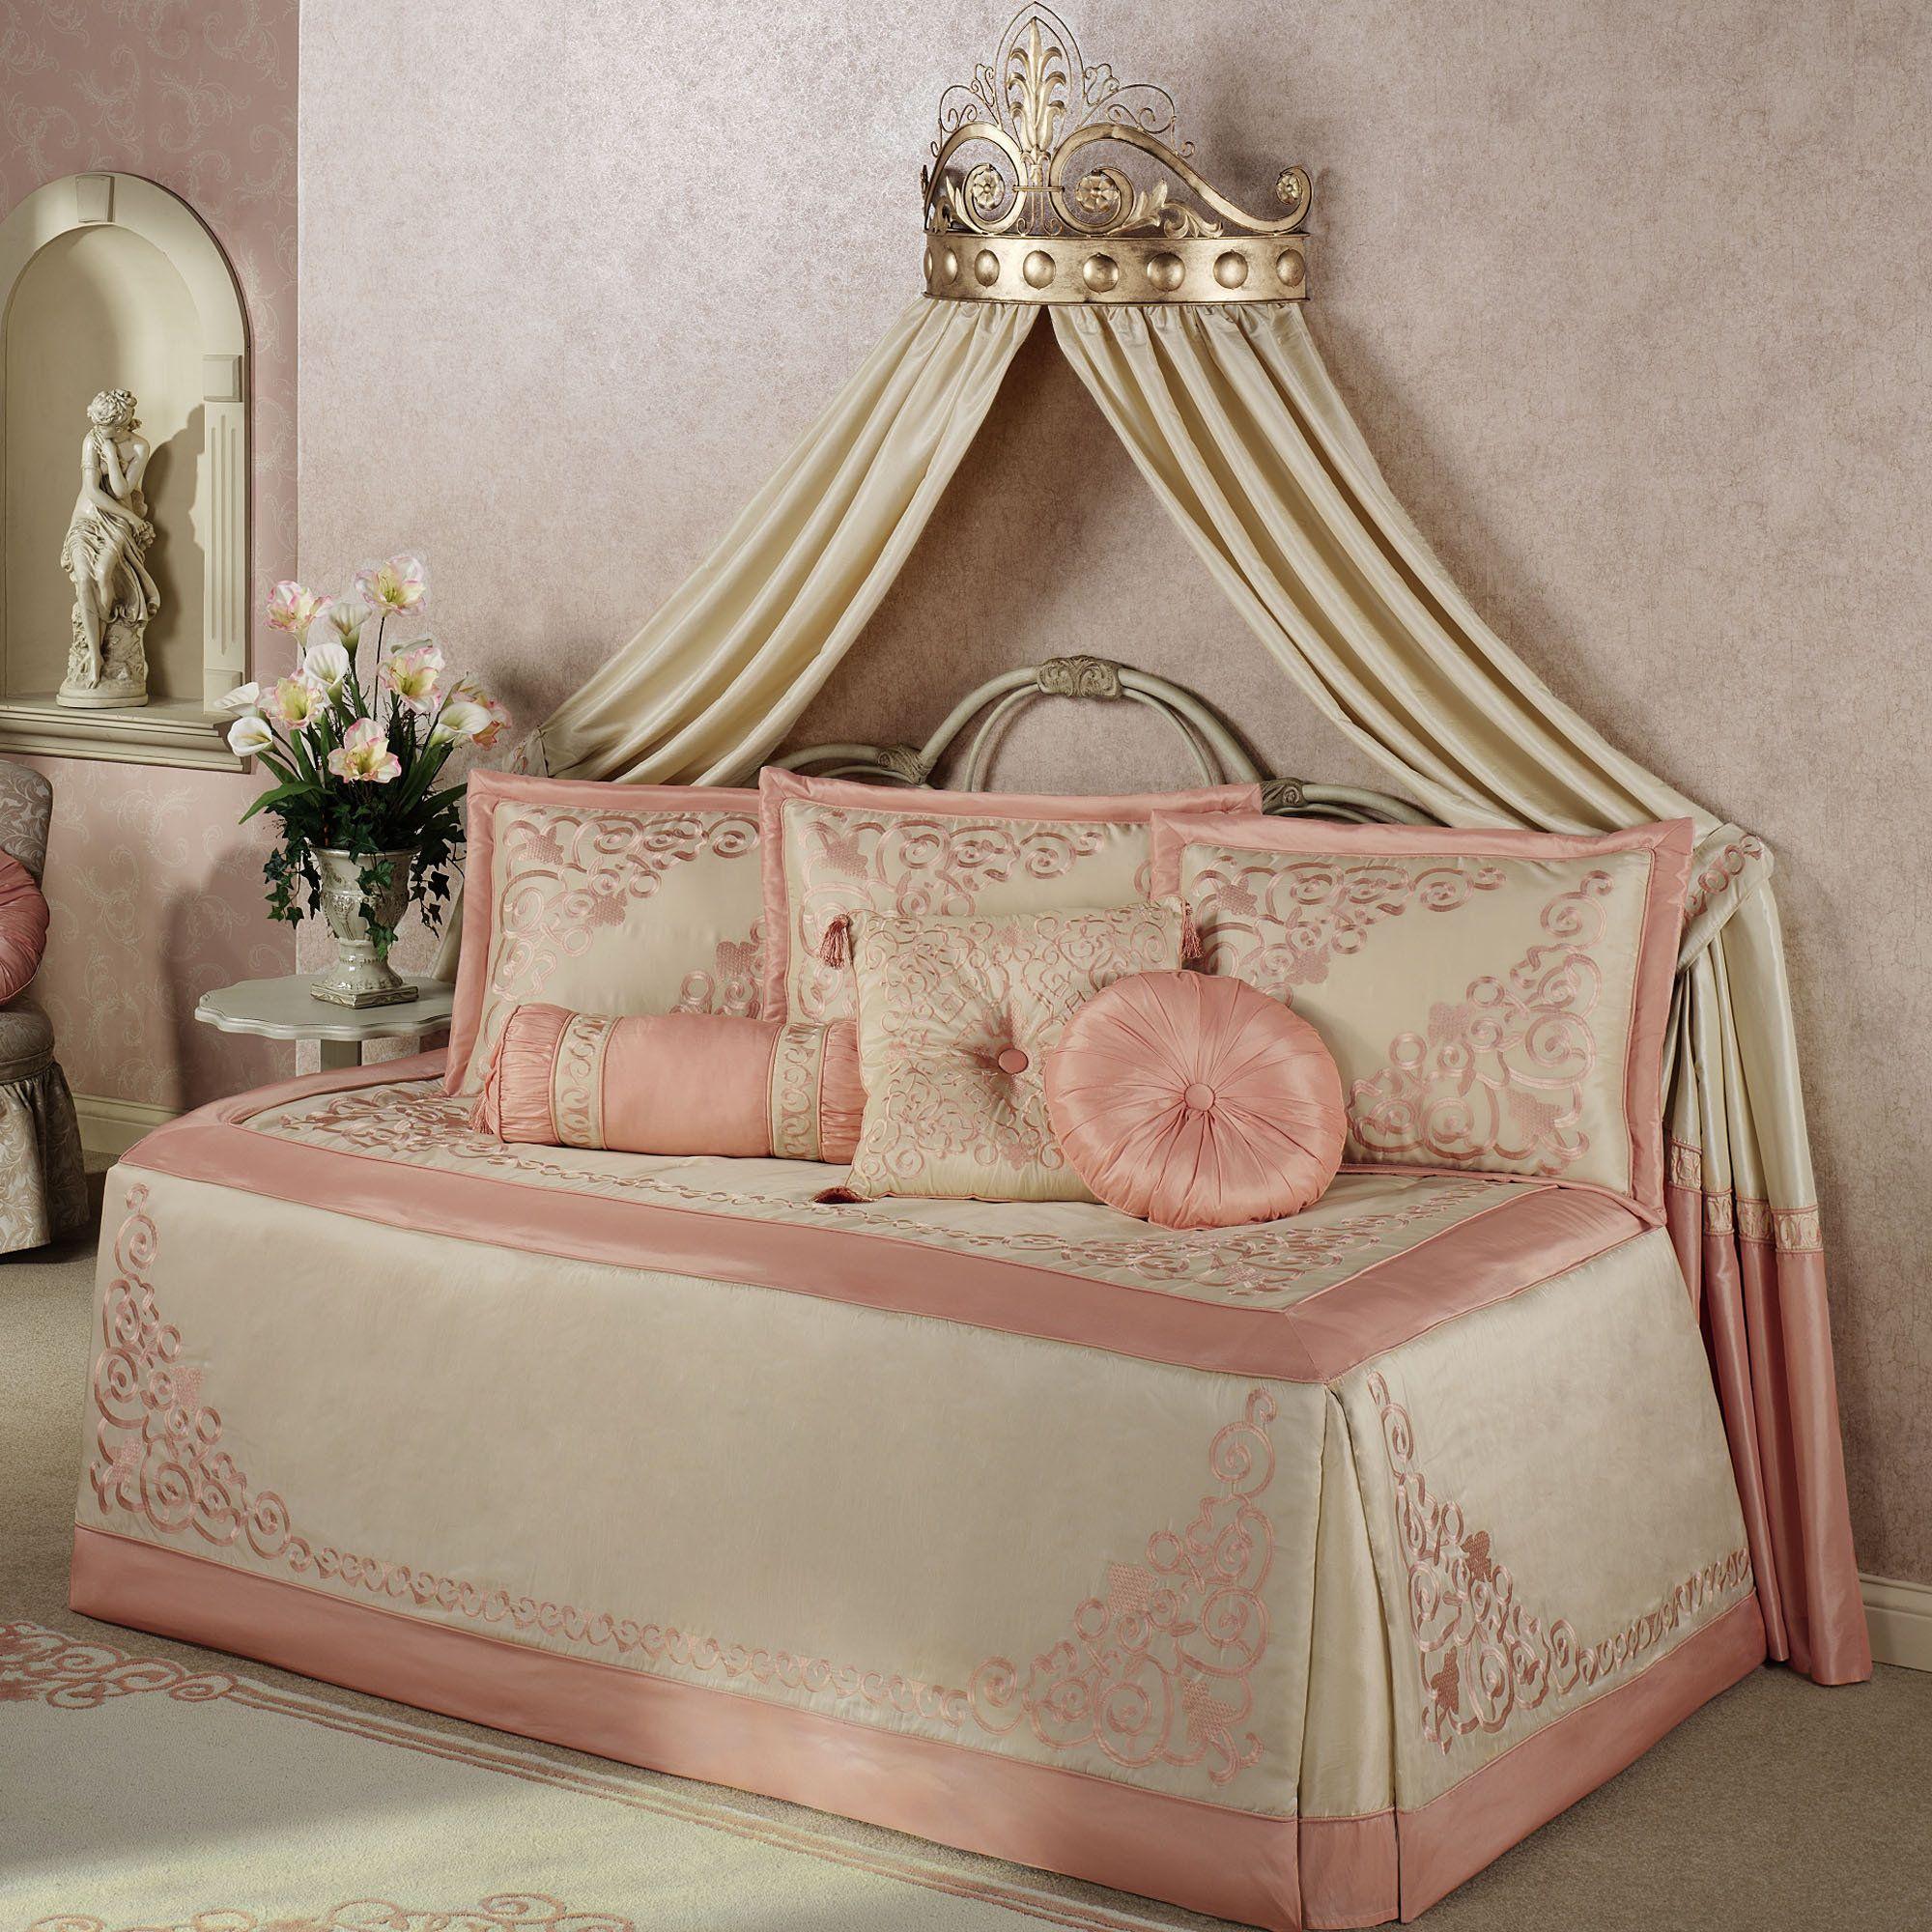 Princess Blush Daybed Bedding